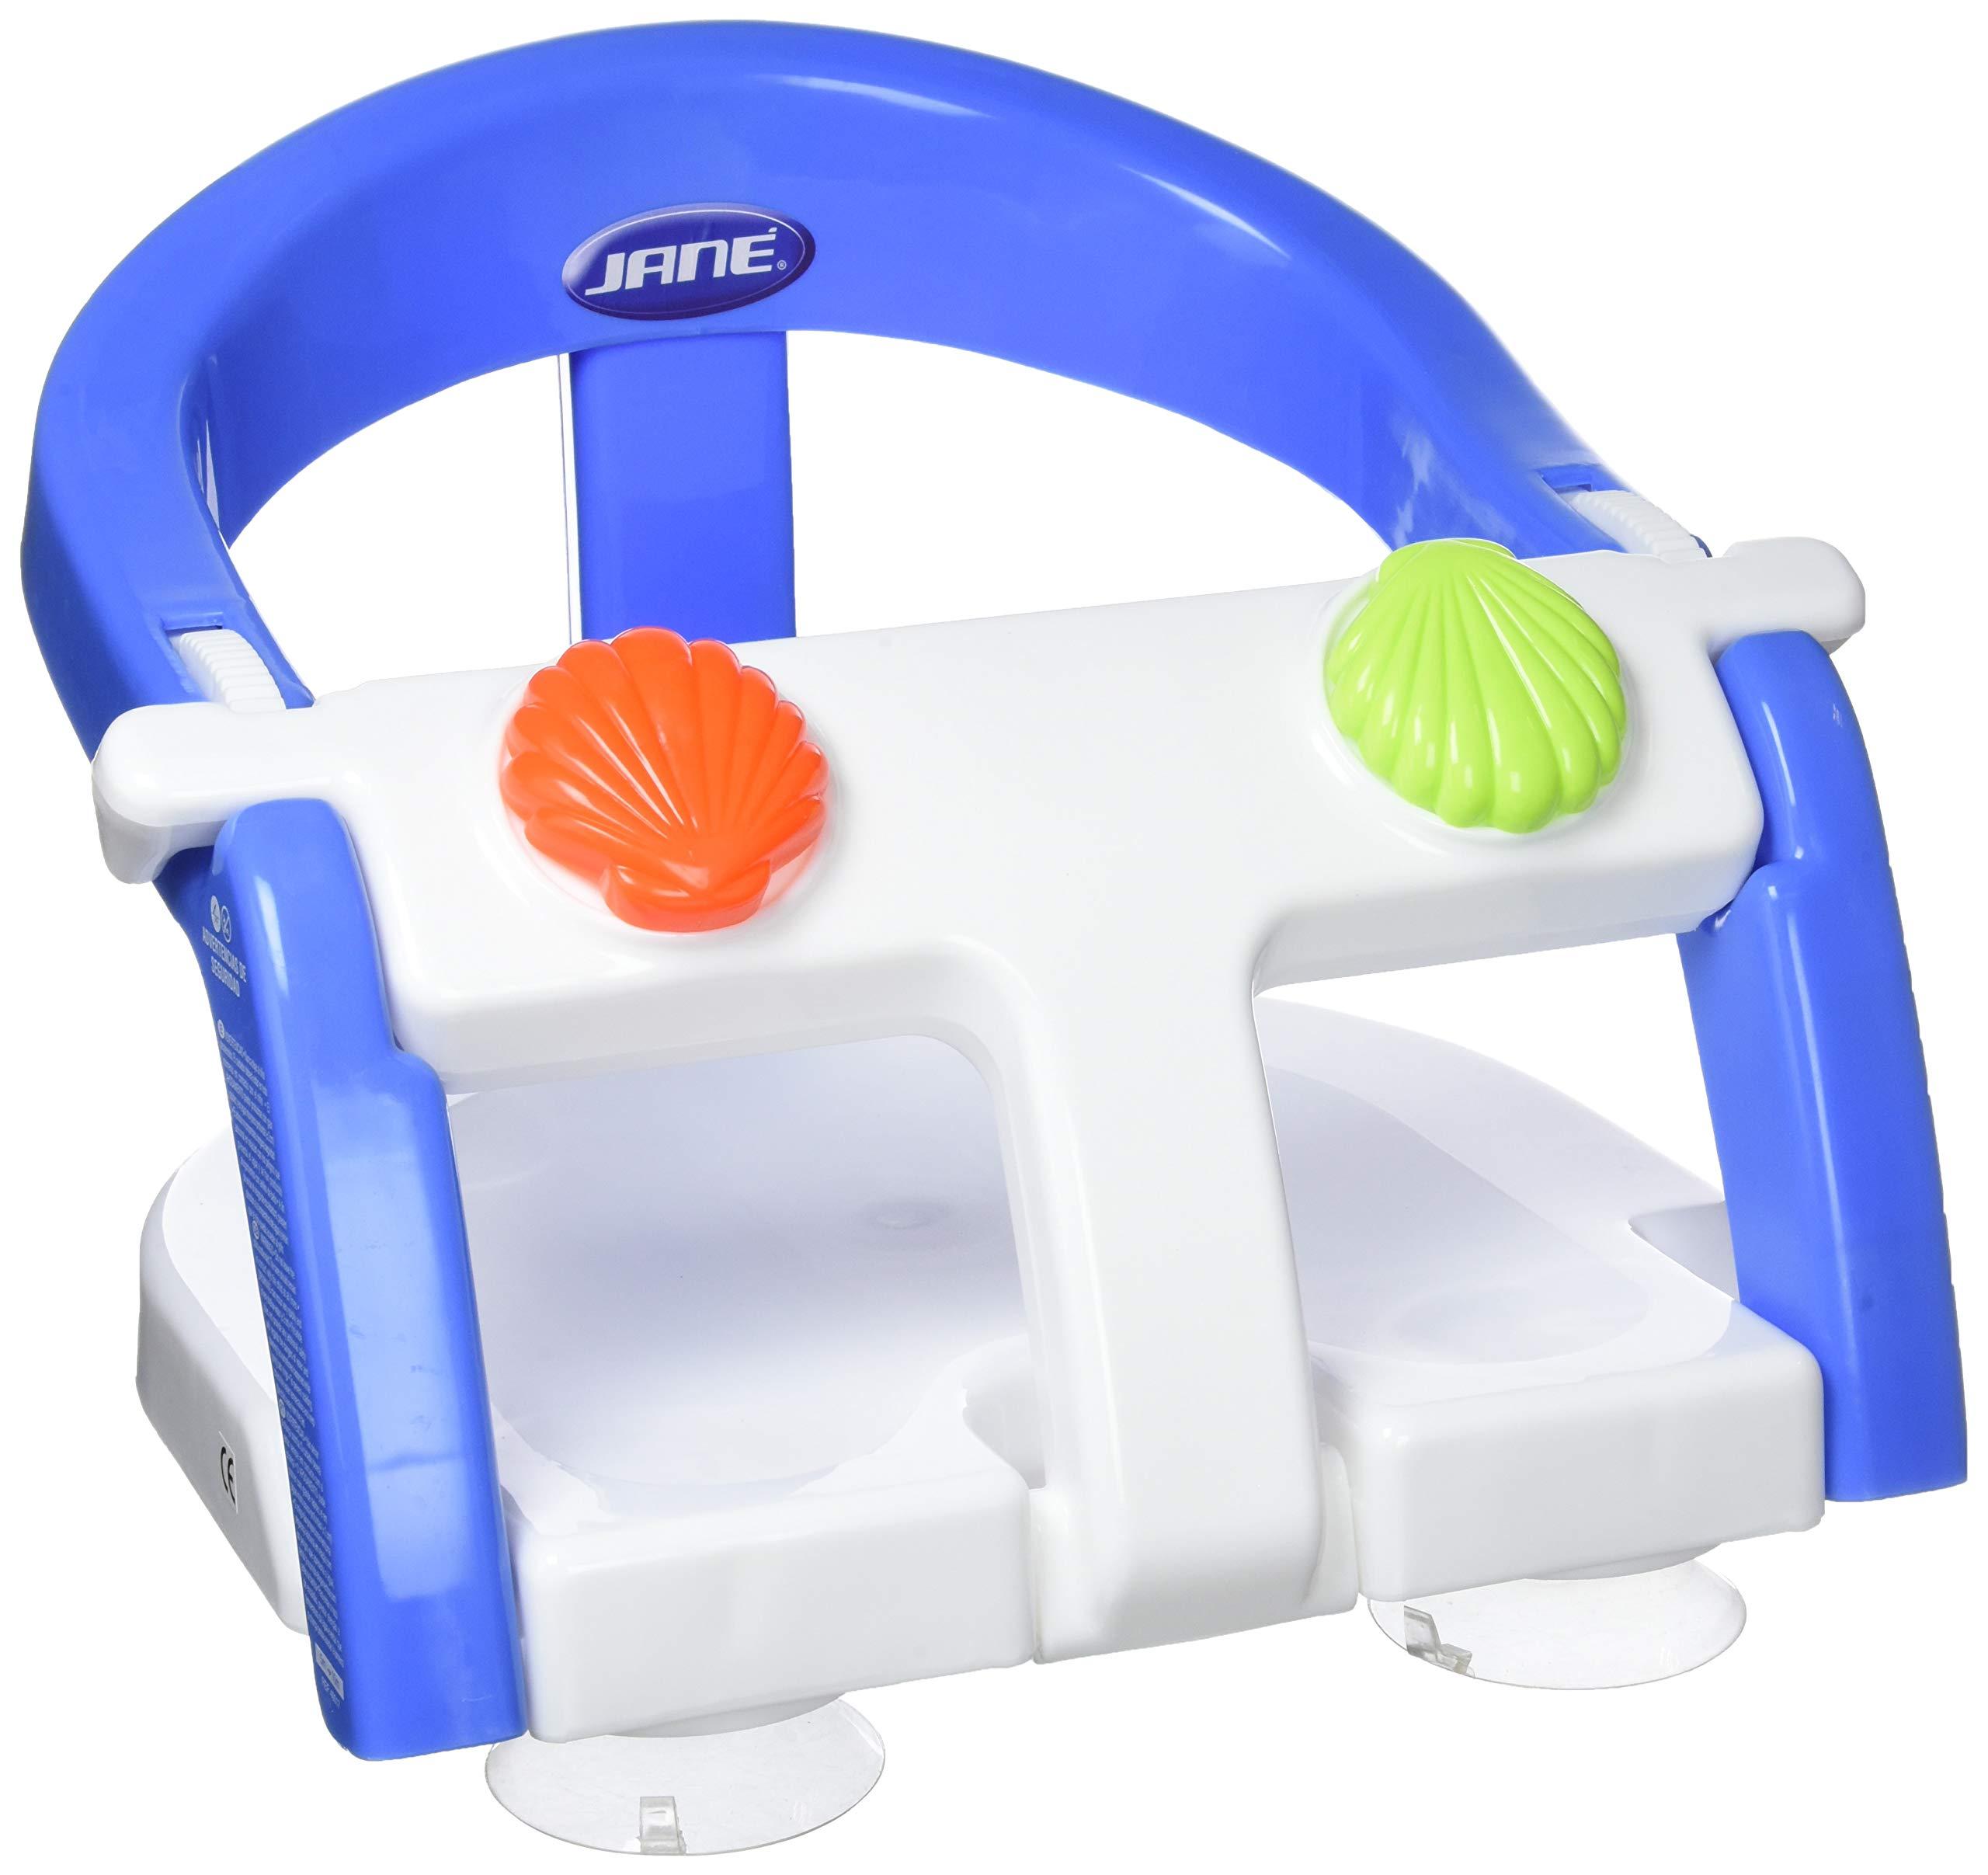 Jane Fluid Bath Ring Seat (Blue) 1